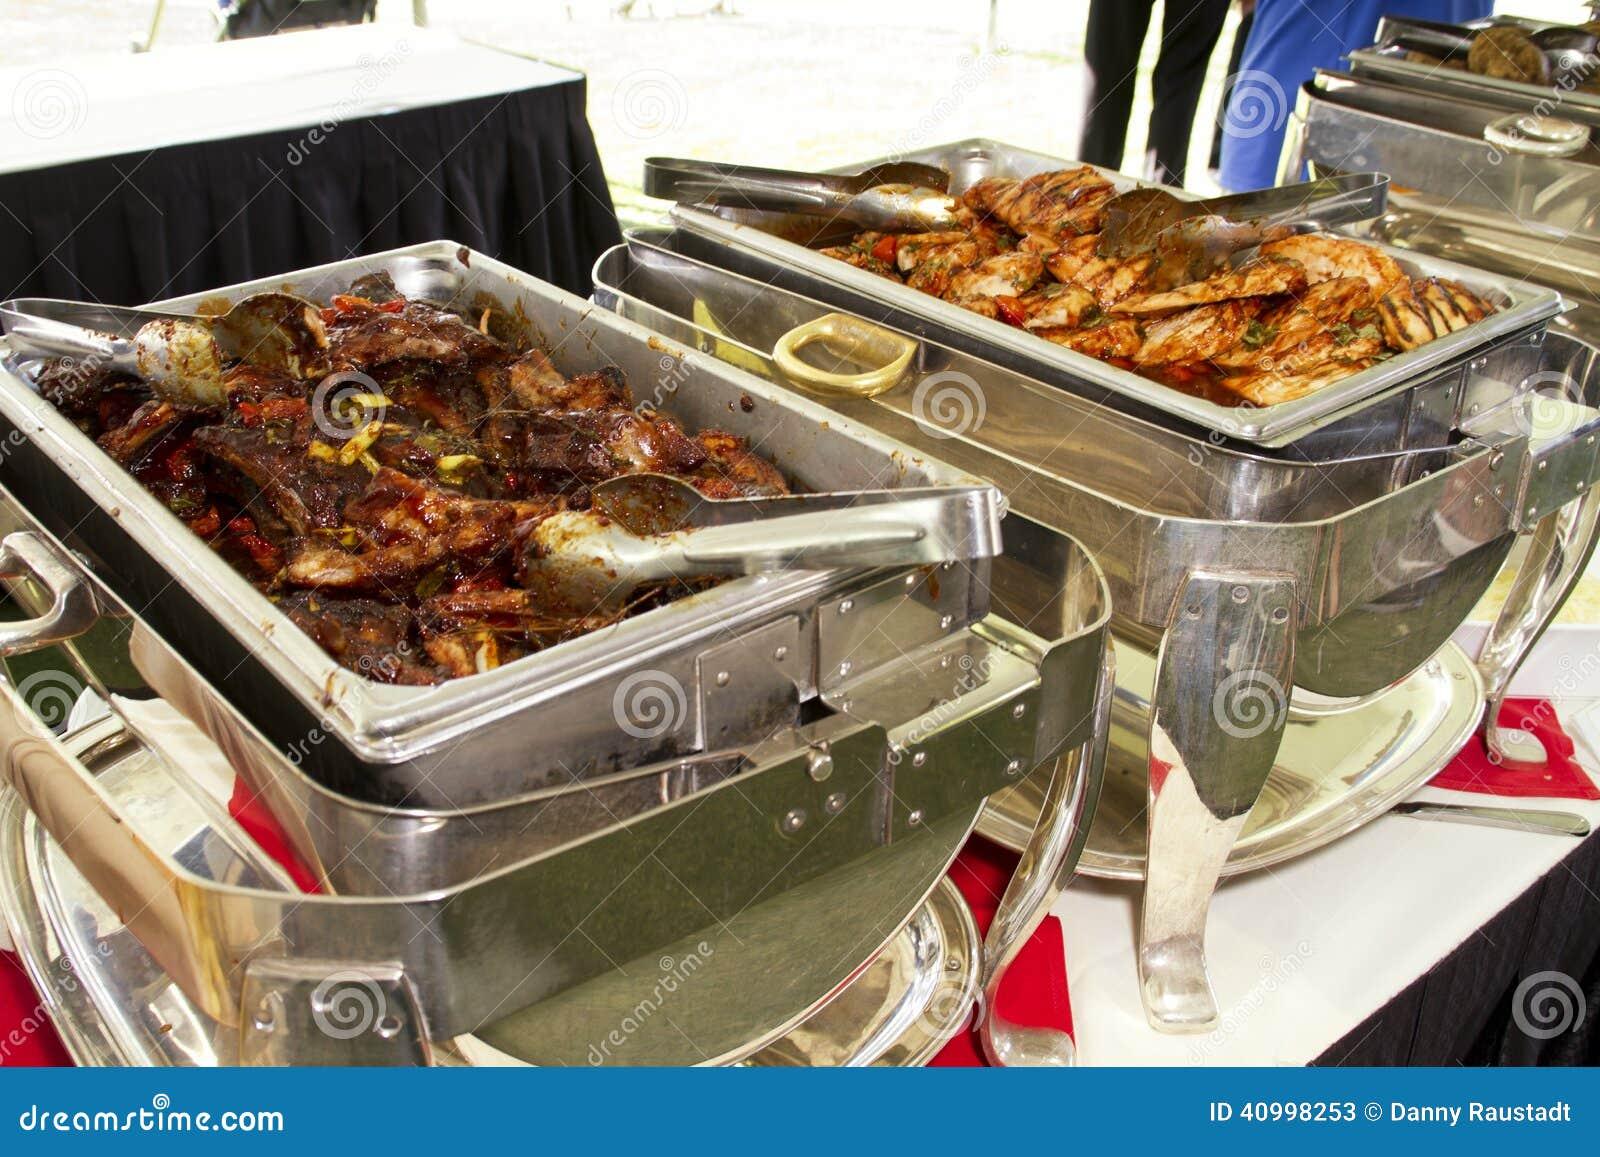 Hotel resort buffet meal